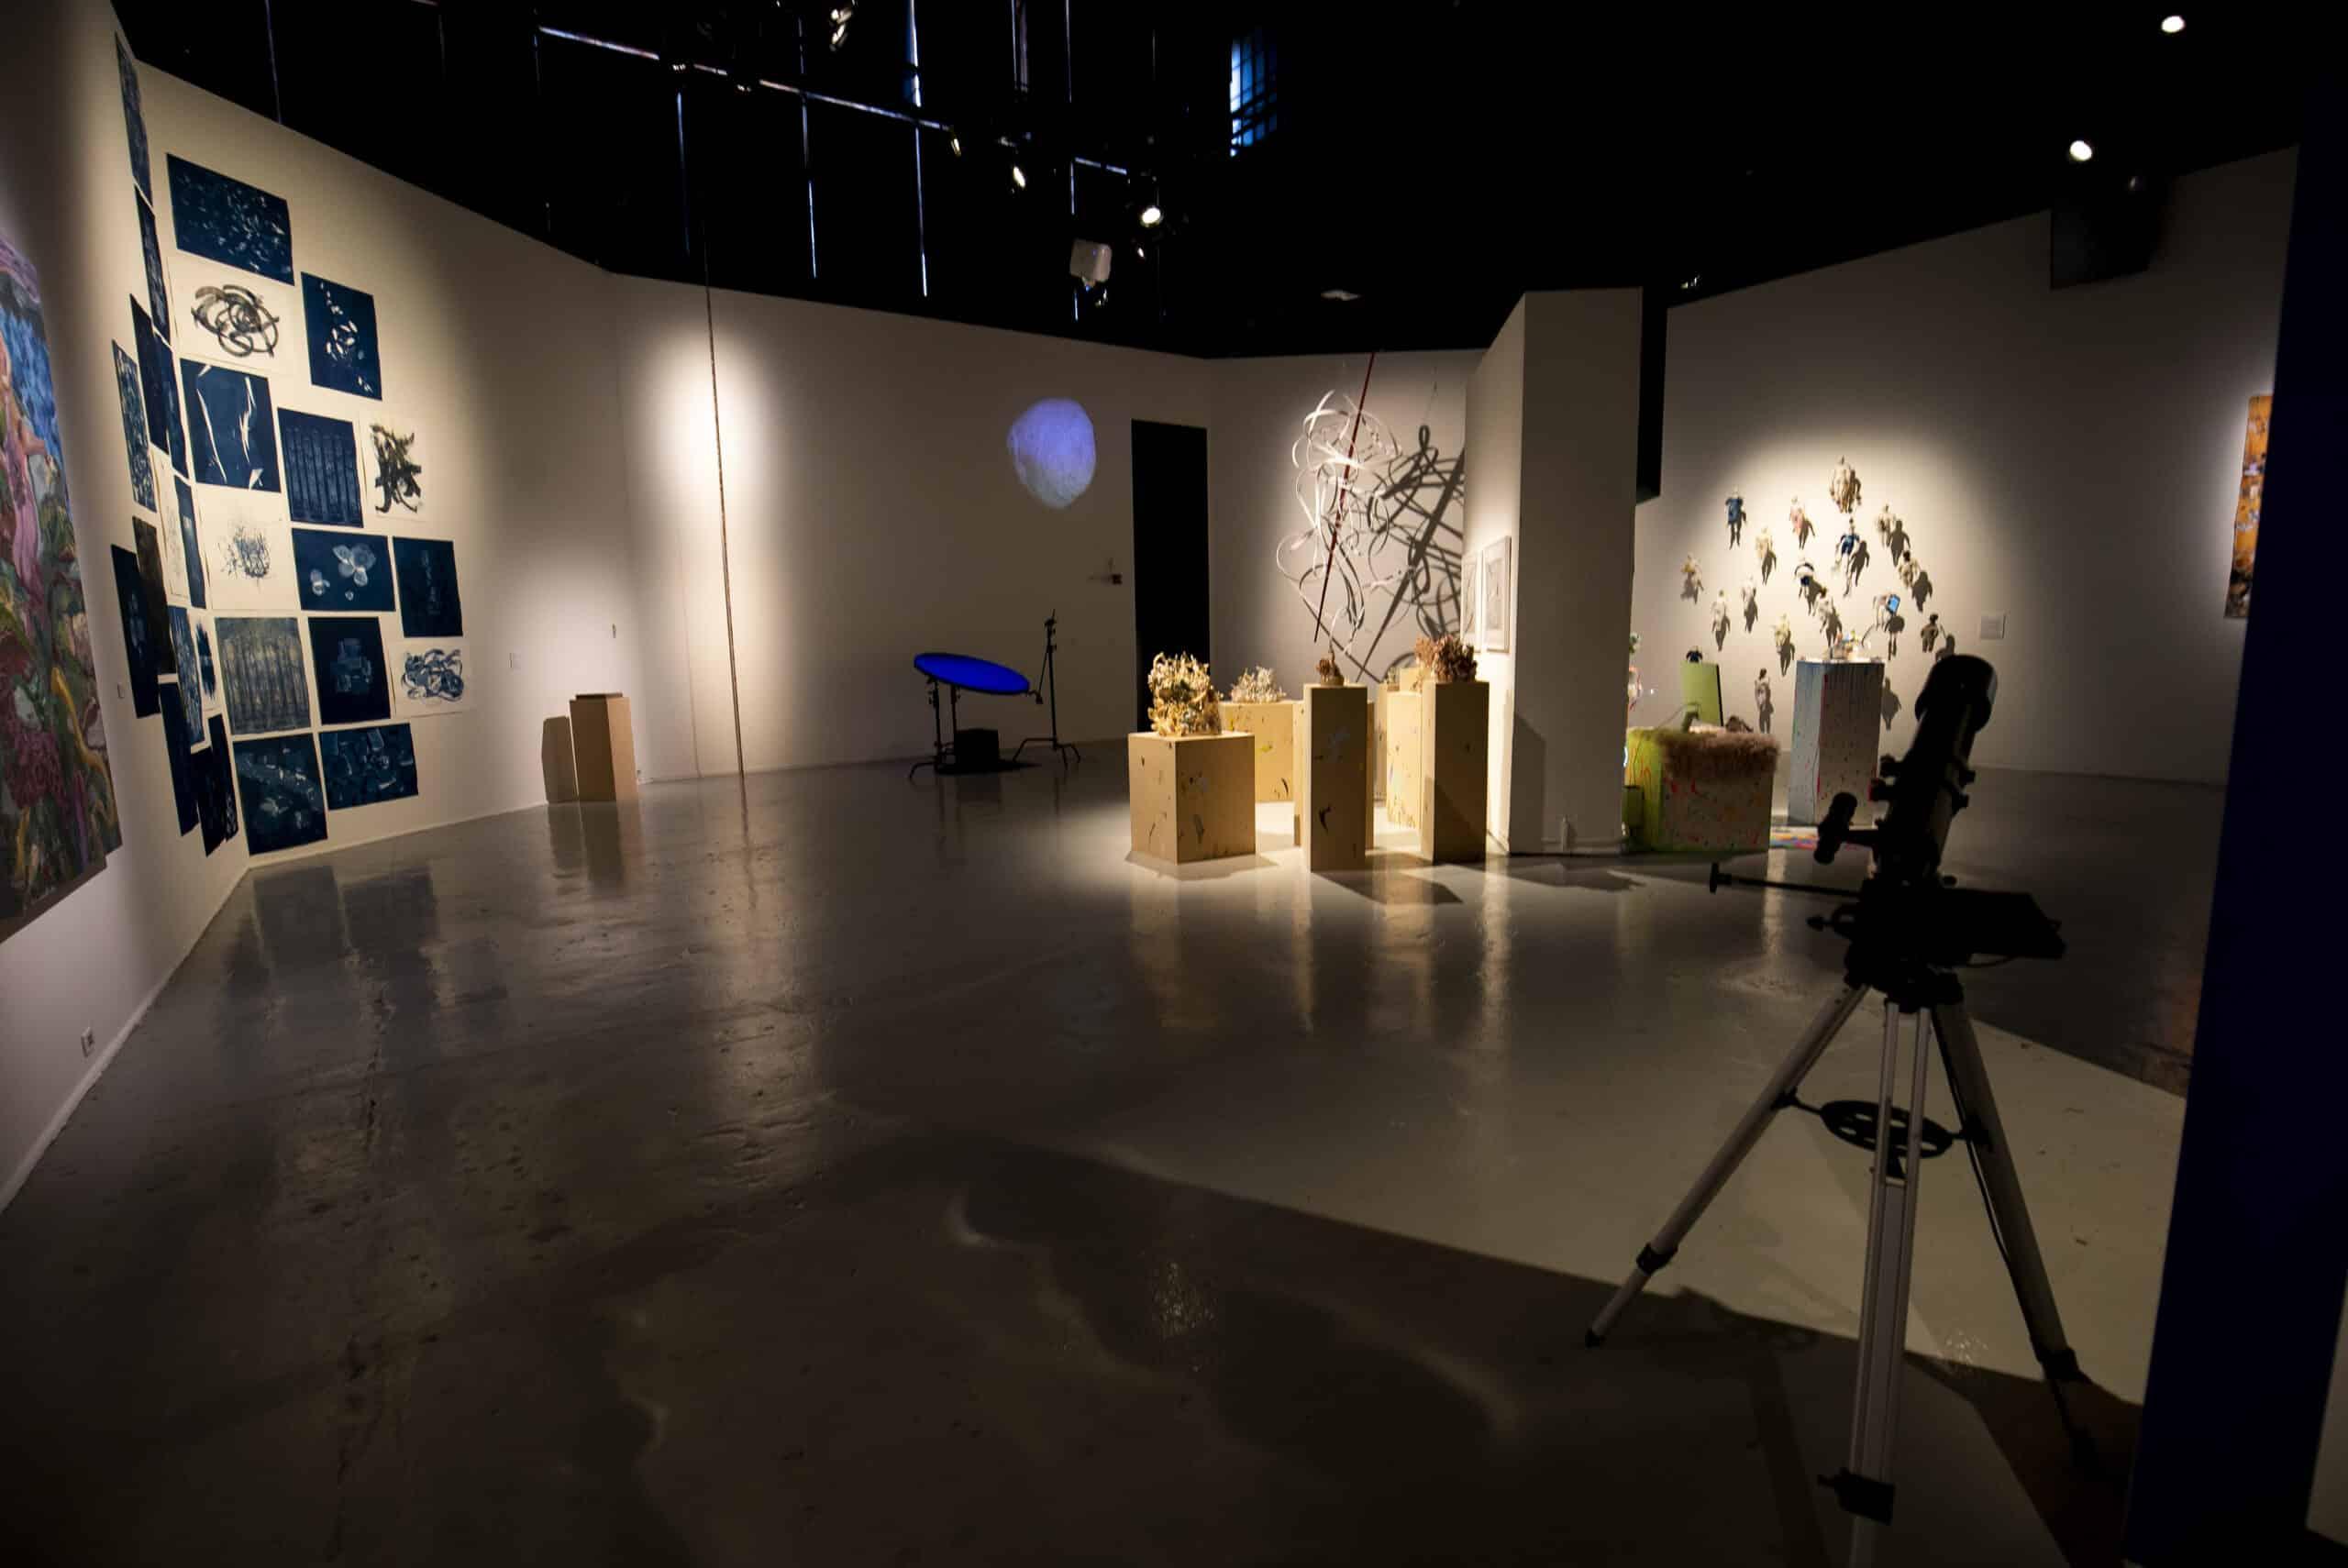 The Annual Murphy & Cadogan Art Awards Exhibition 2021